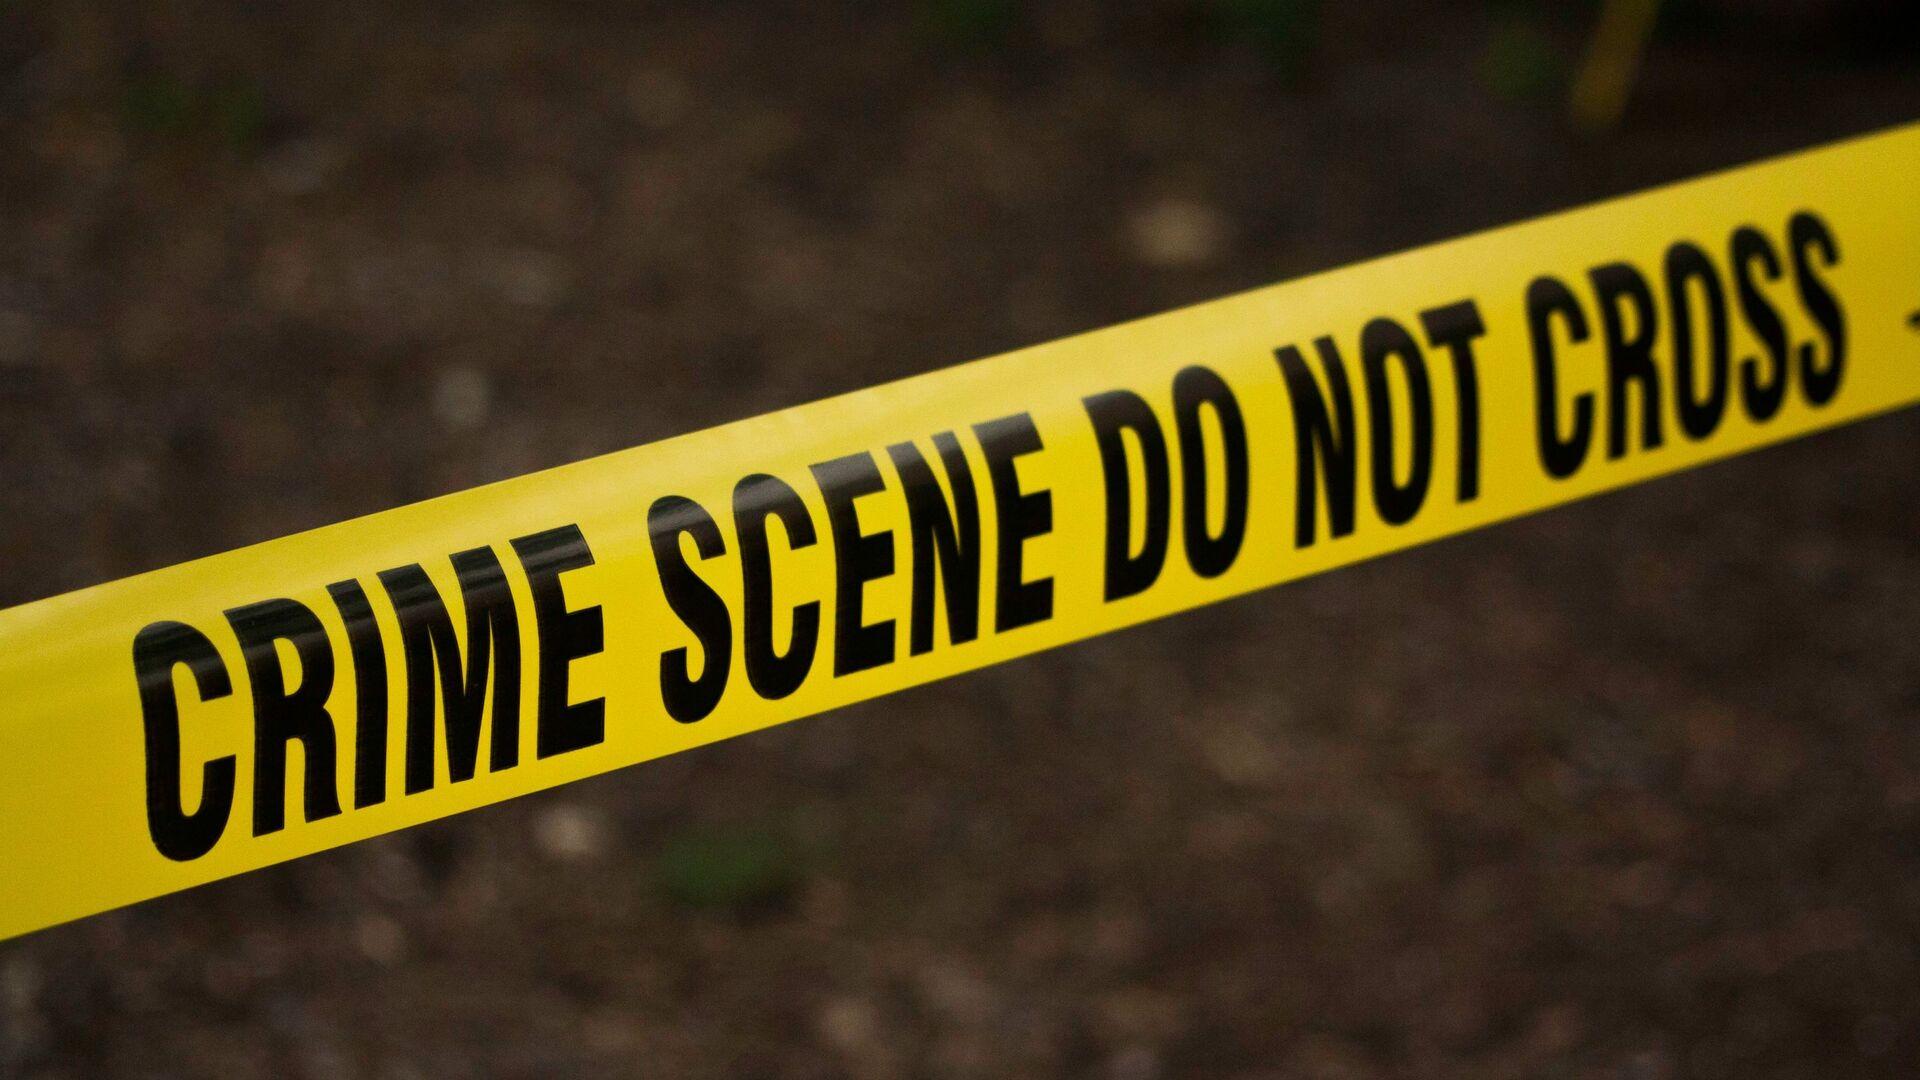 US police crime scene tape - Sputnik International, 1920, 10.06.2021